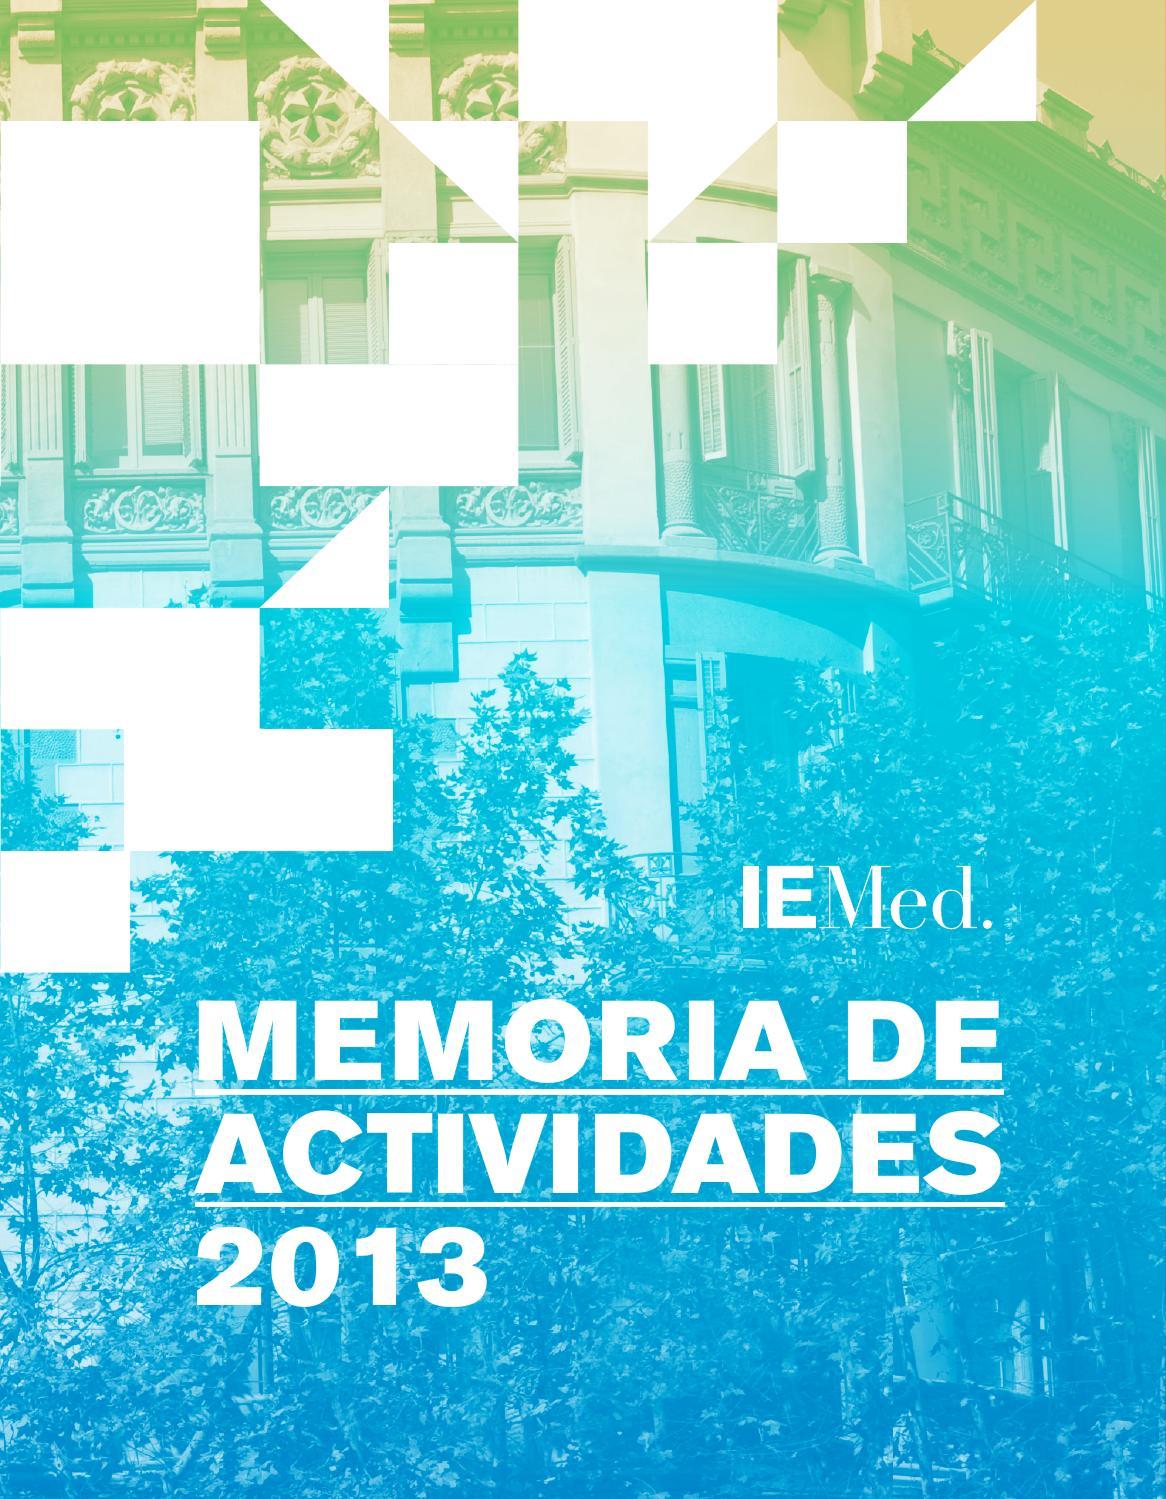 Memoria de actividades 2013 by IEMed (European Institute of the ...